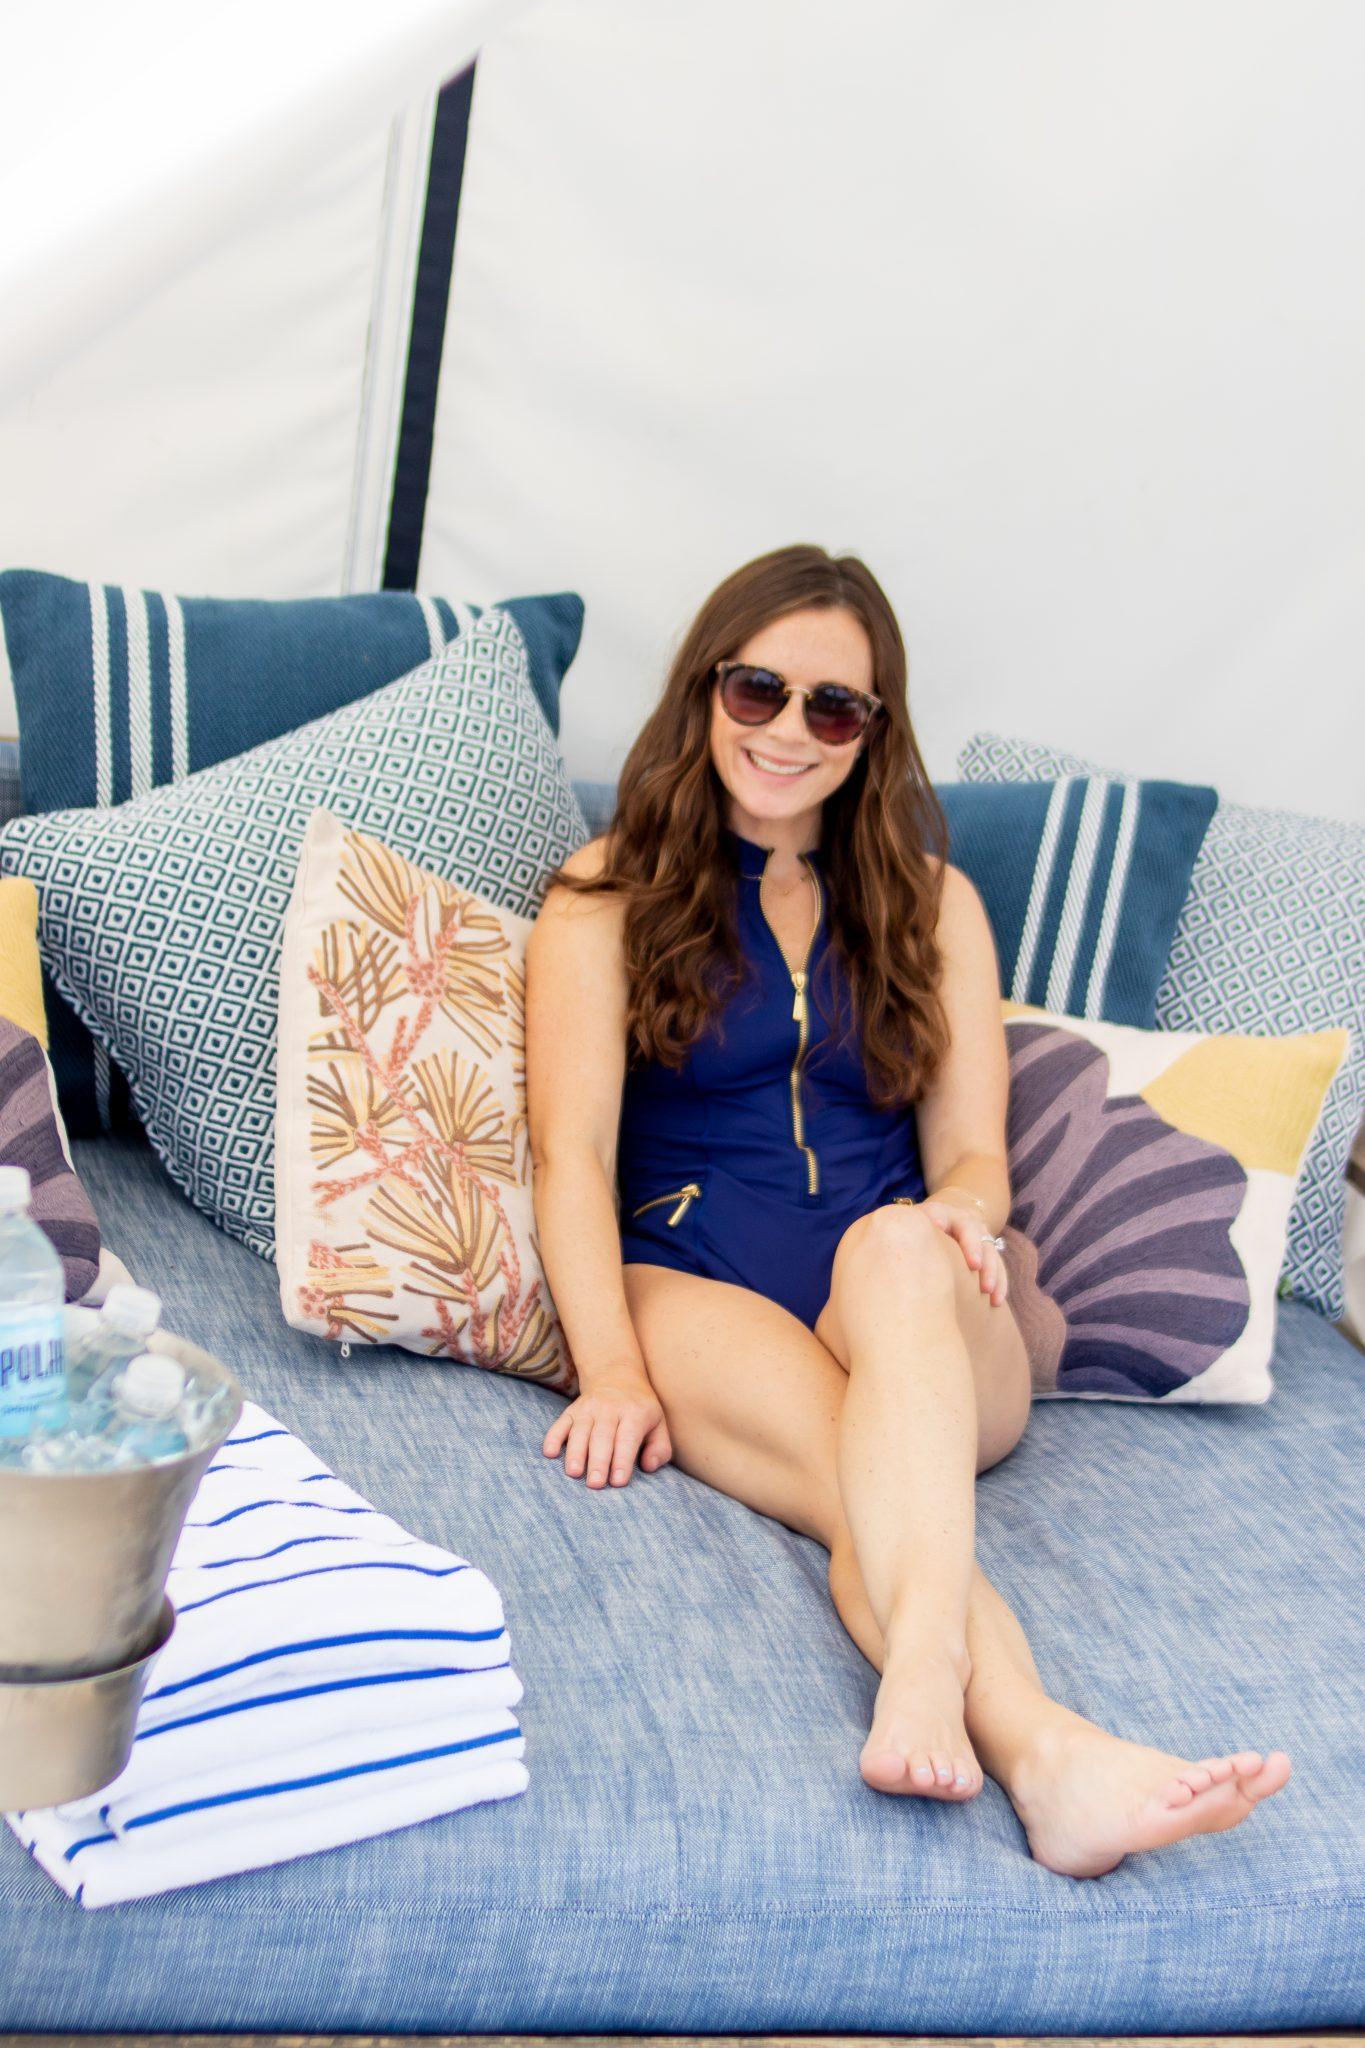 Woman in zip up cabana life bathing suit in cabana poolside winnetu